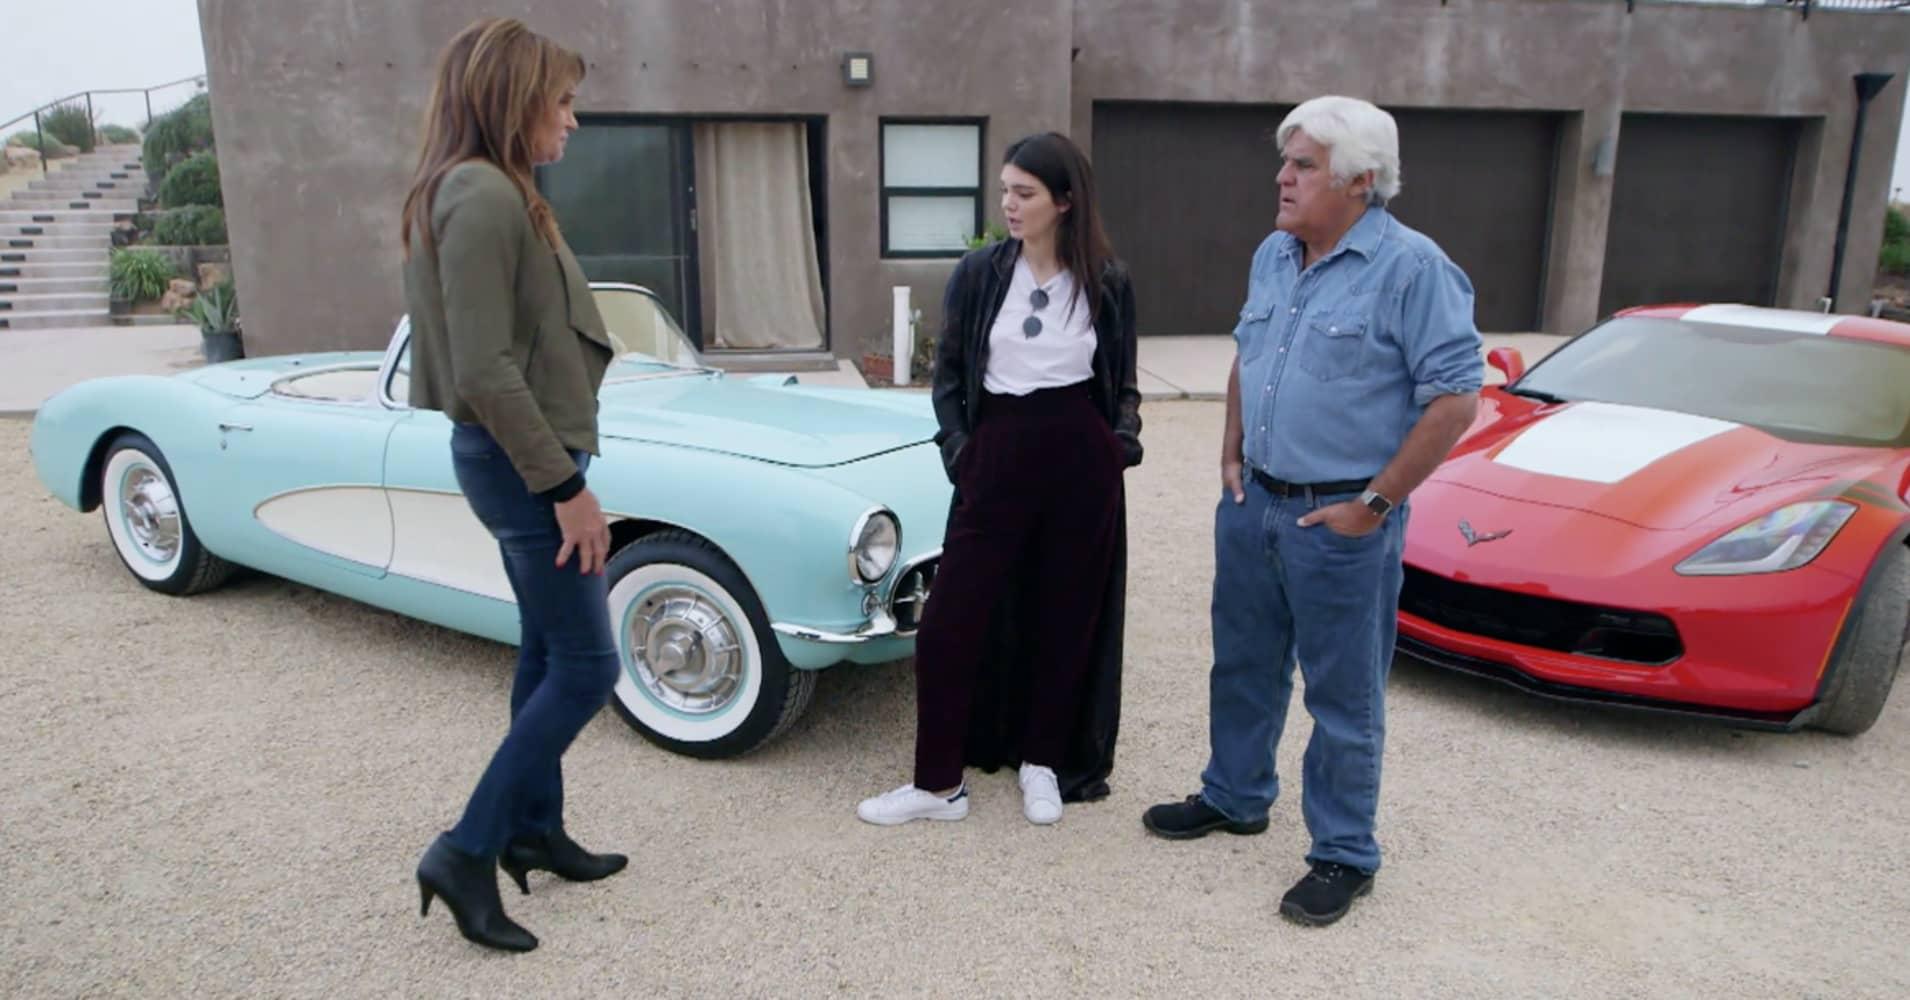 Driving A Racecar >> Jay Leno's Garage: 'Old School vs New School' Gallery